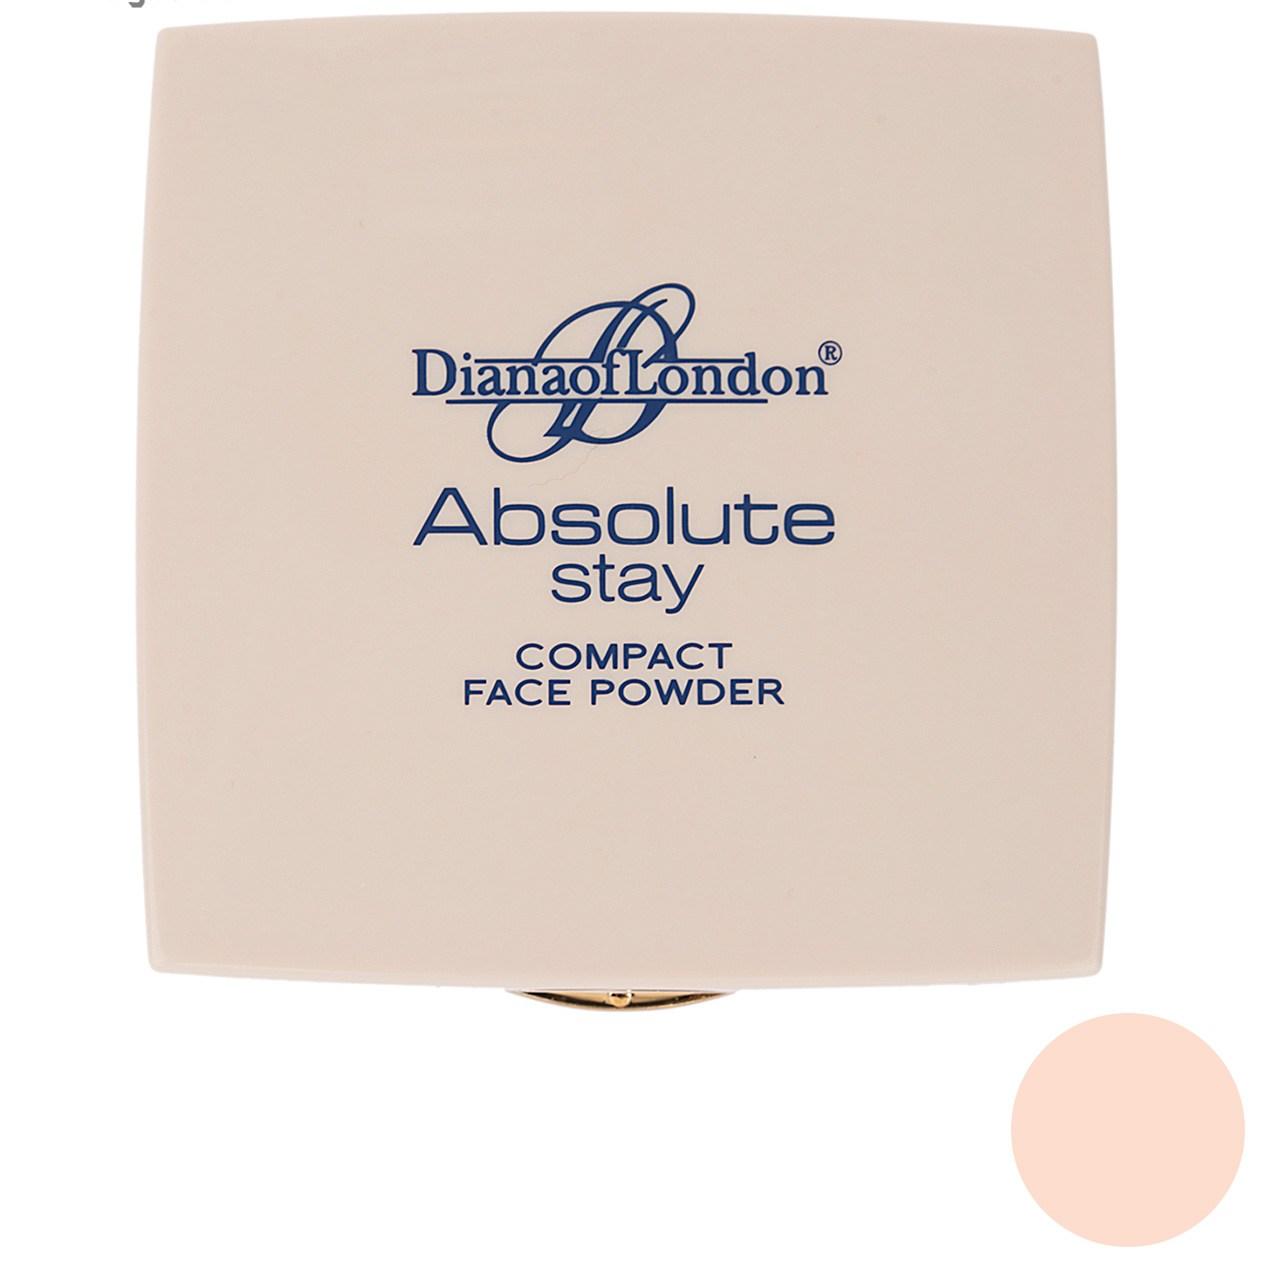 پنکیک دایانا آف لاندن سری Absolute Stay مدل Nud Rose شماره 404